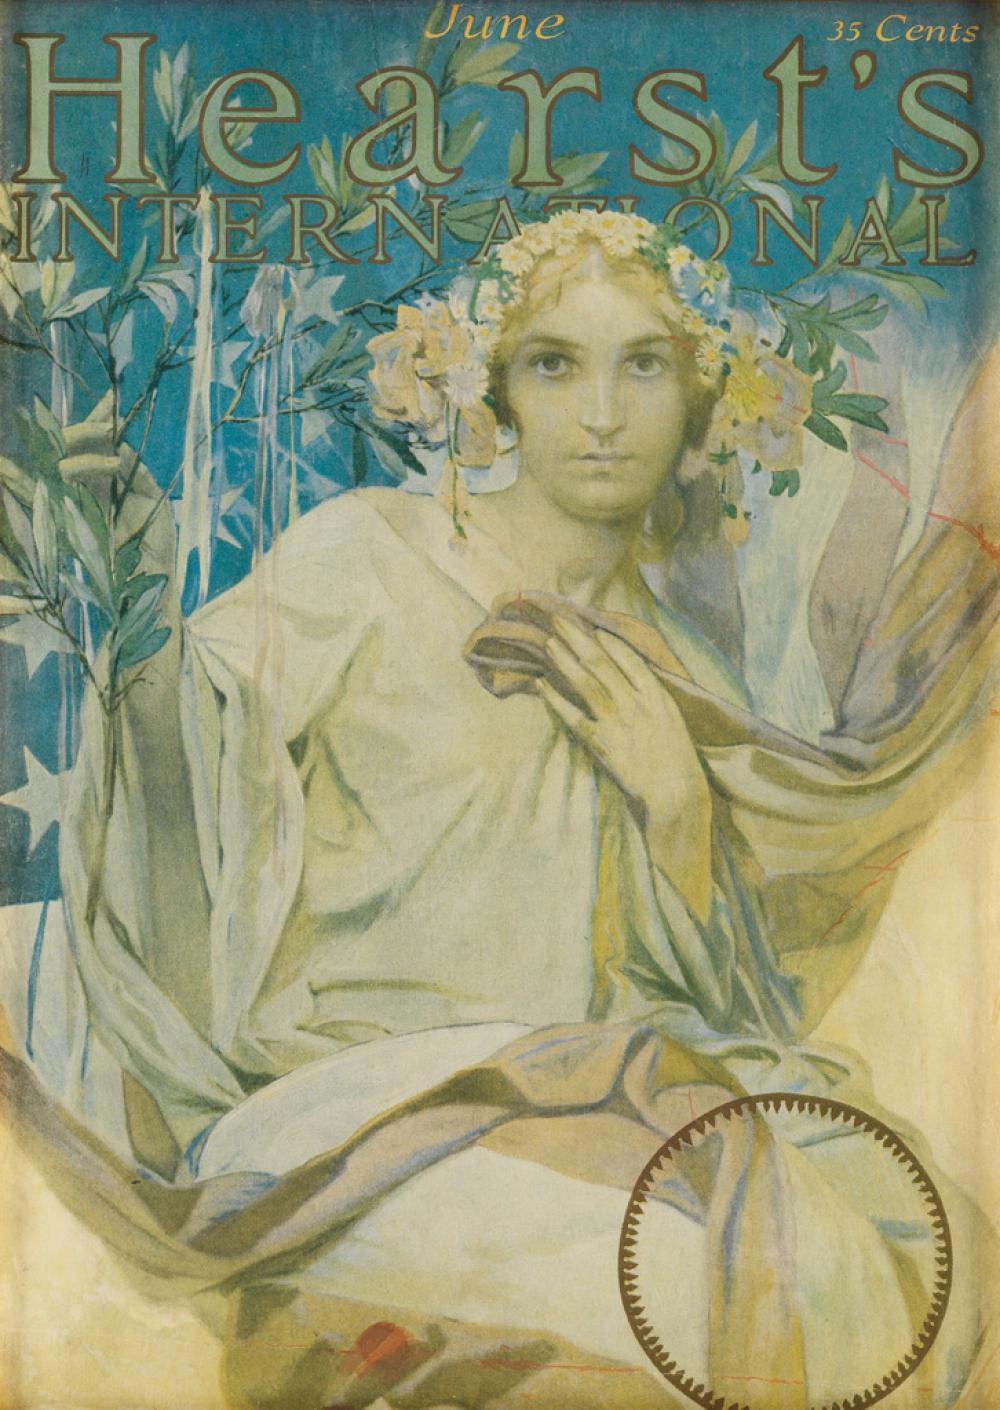 ALPHONSE MUCHA (1860-1939). HEARST''S INTERNATIONAL / JUNE. Magazine cover. 1922. 11x7 inches, 28x20 cm.